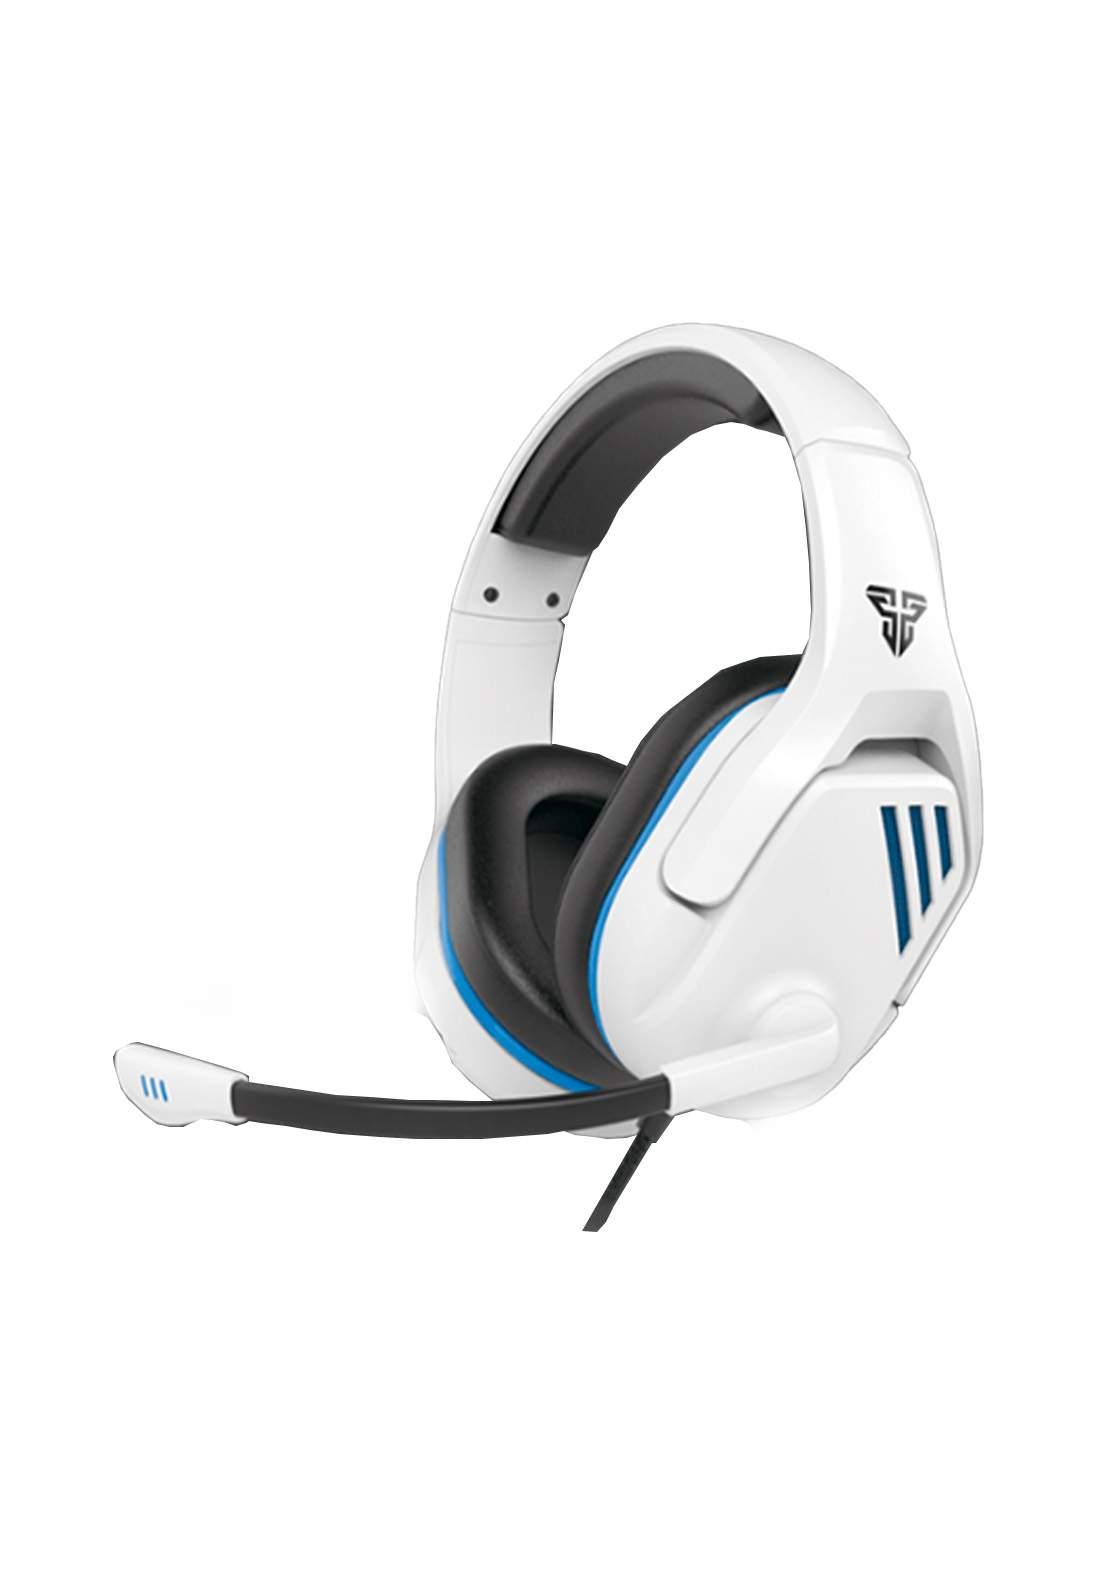 Fantech MH86 Valor Gaming Headset - White سماعة